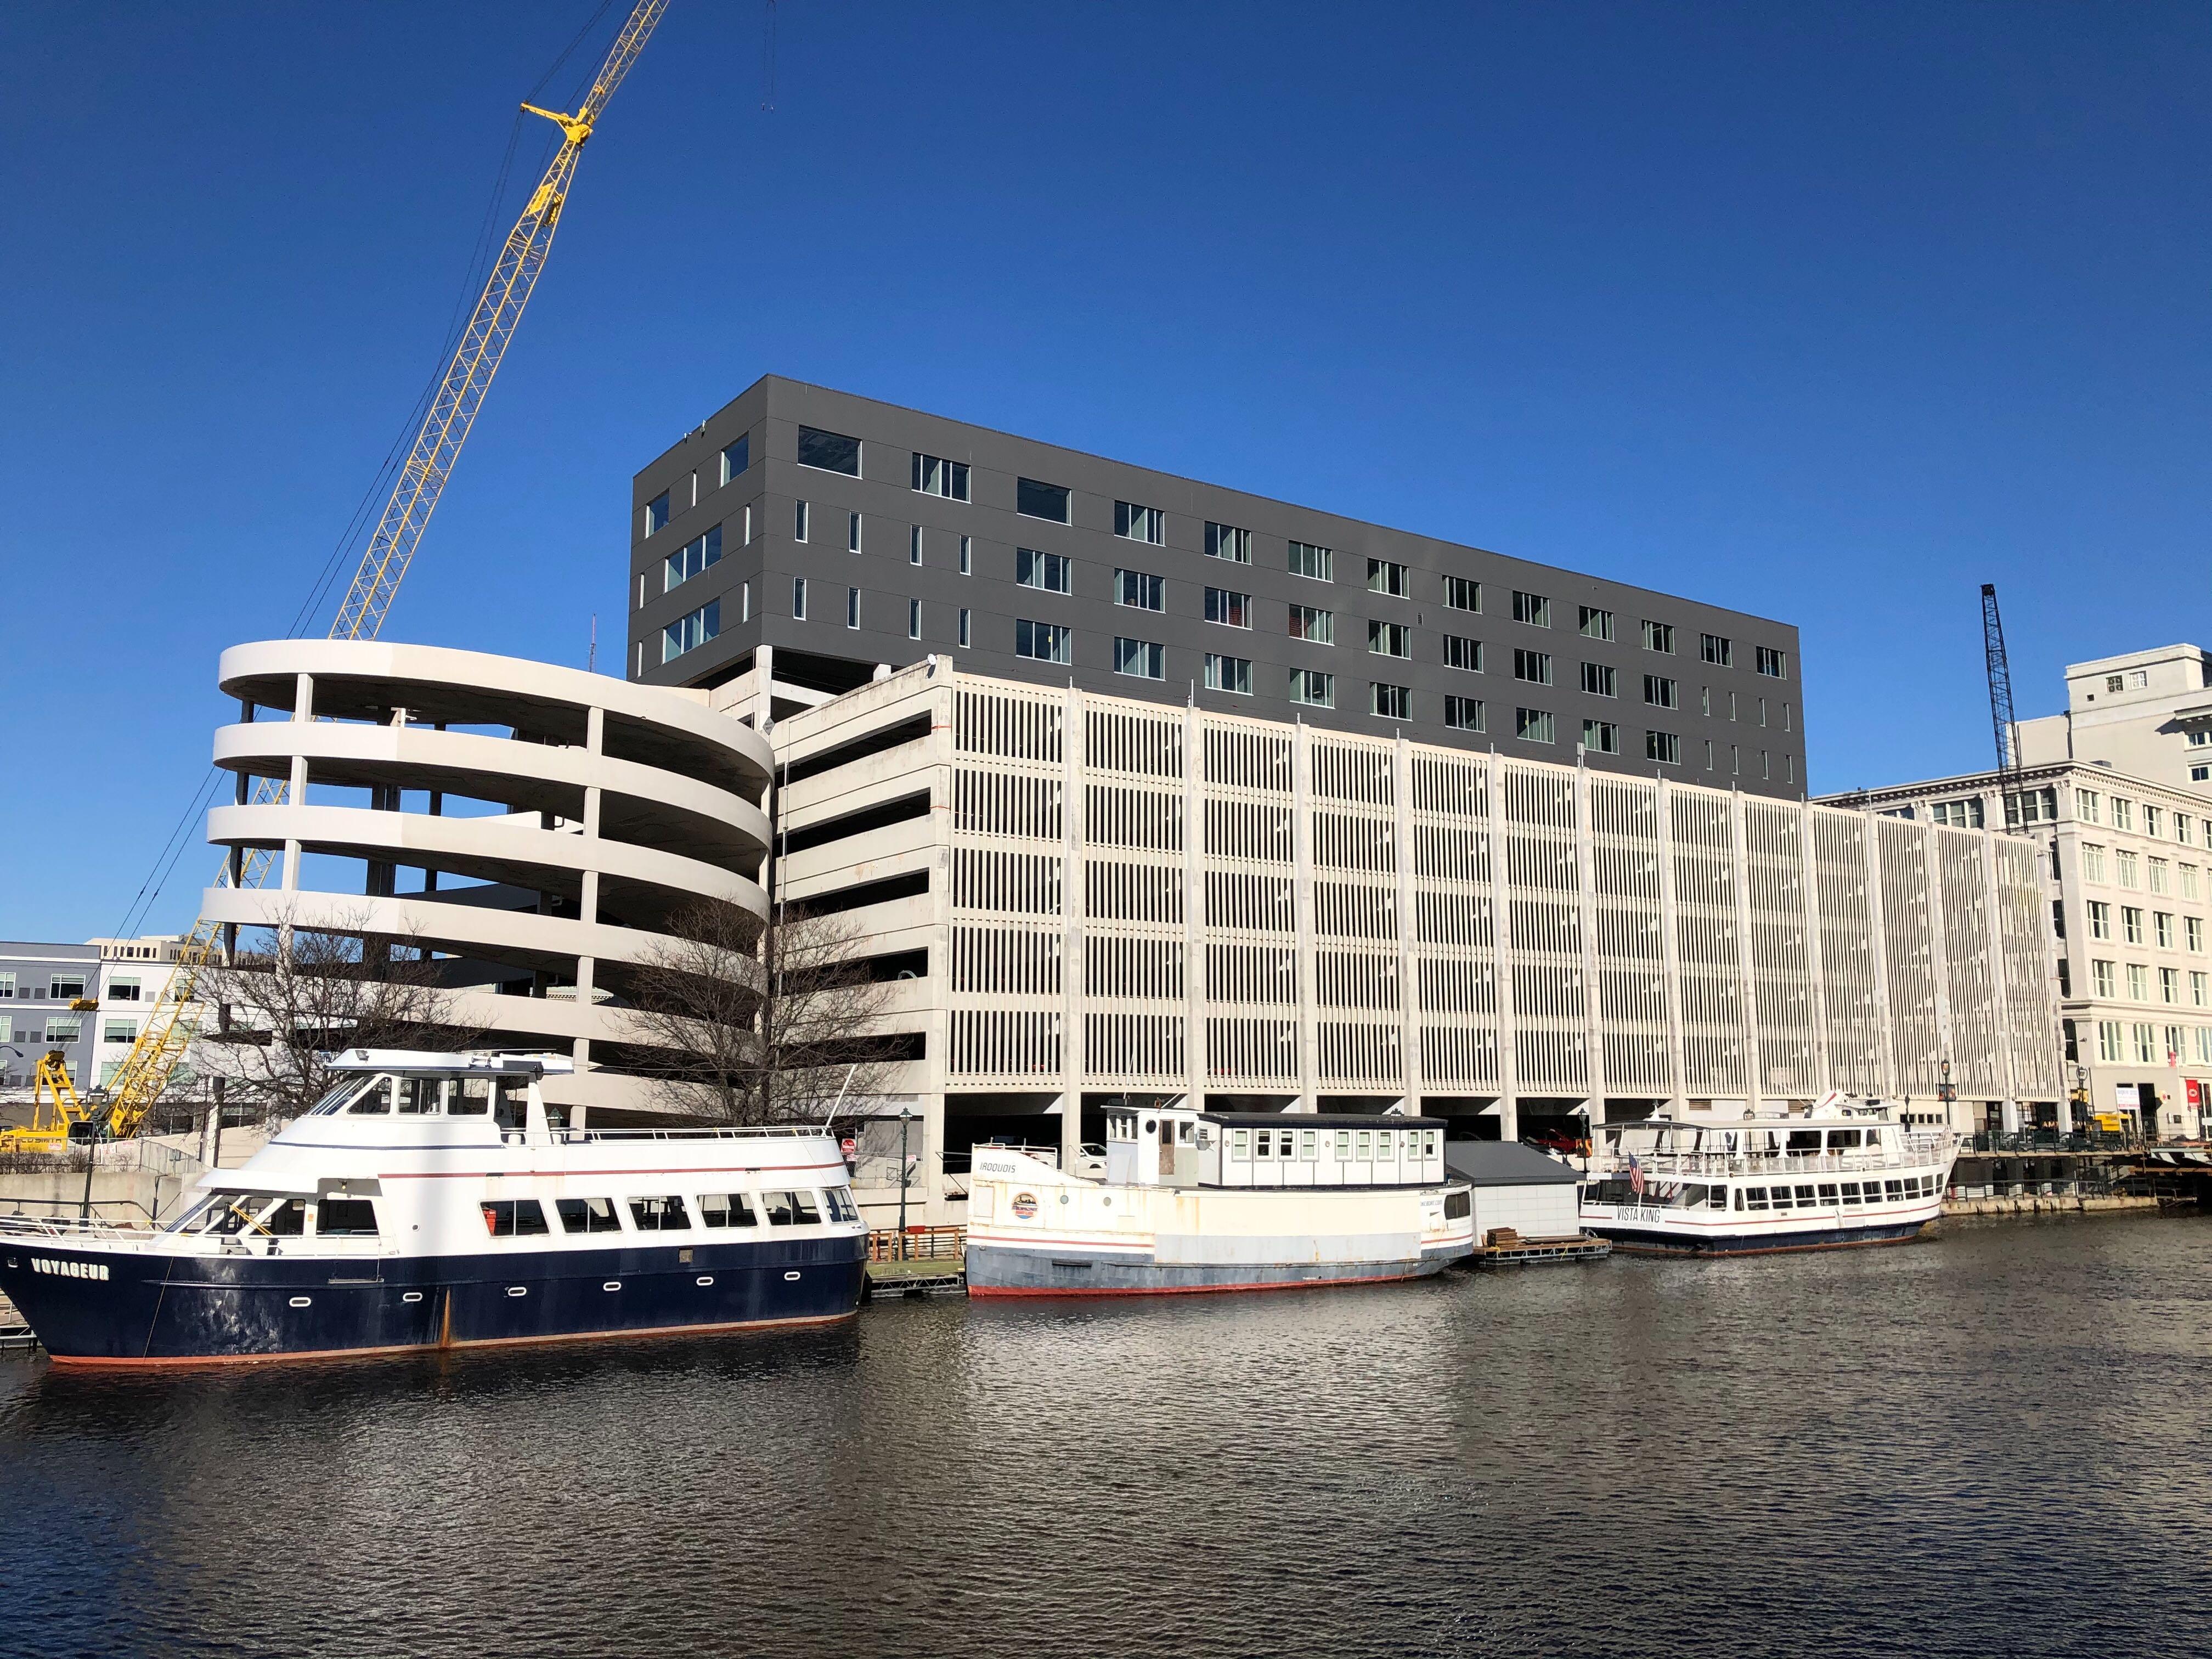 105-111 W. Michigan St. redevelopment works nears completion. Photo by Jeramey Jannene.